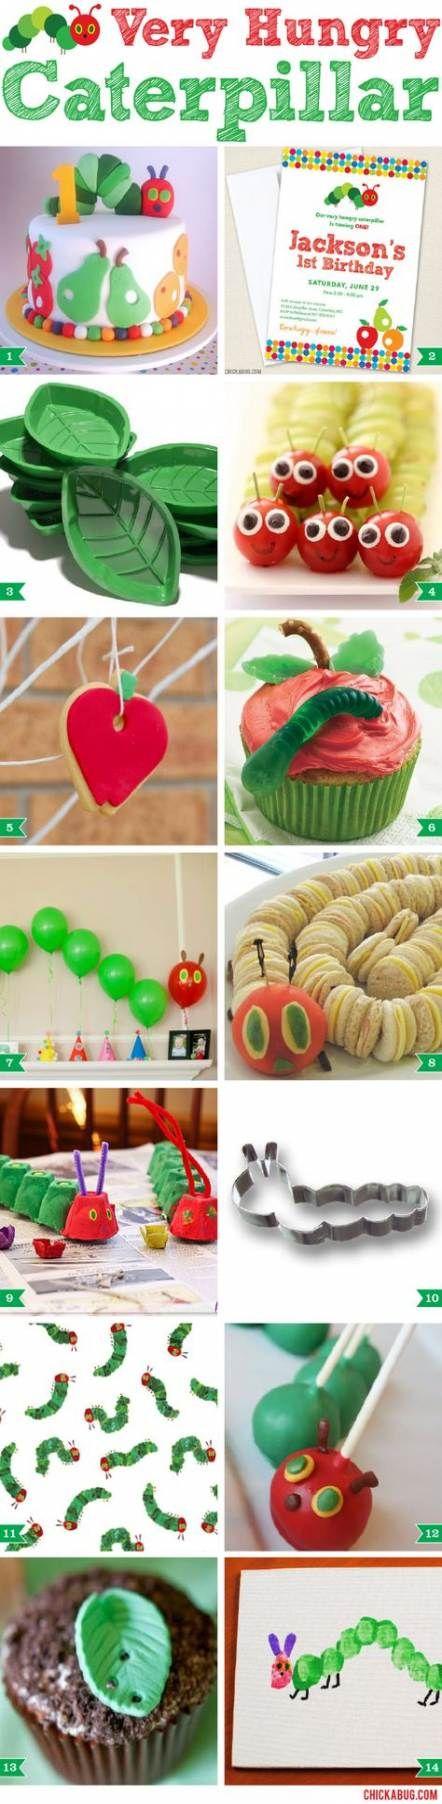 46+ trendy birthday cupcakes for kids boys party ideas 46+ trendy birthday cupcakes for kids boys party ideas